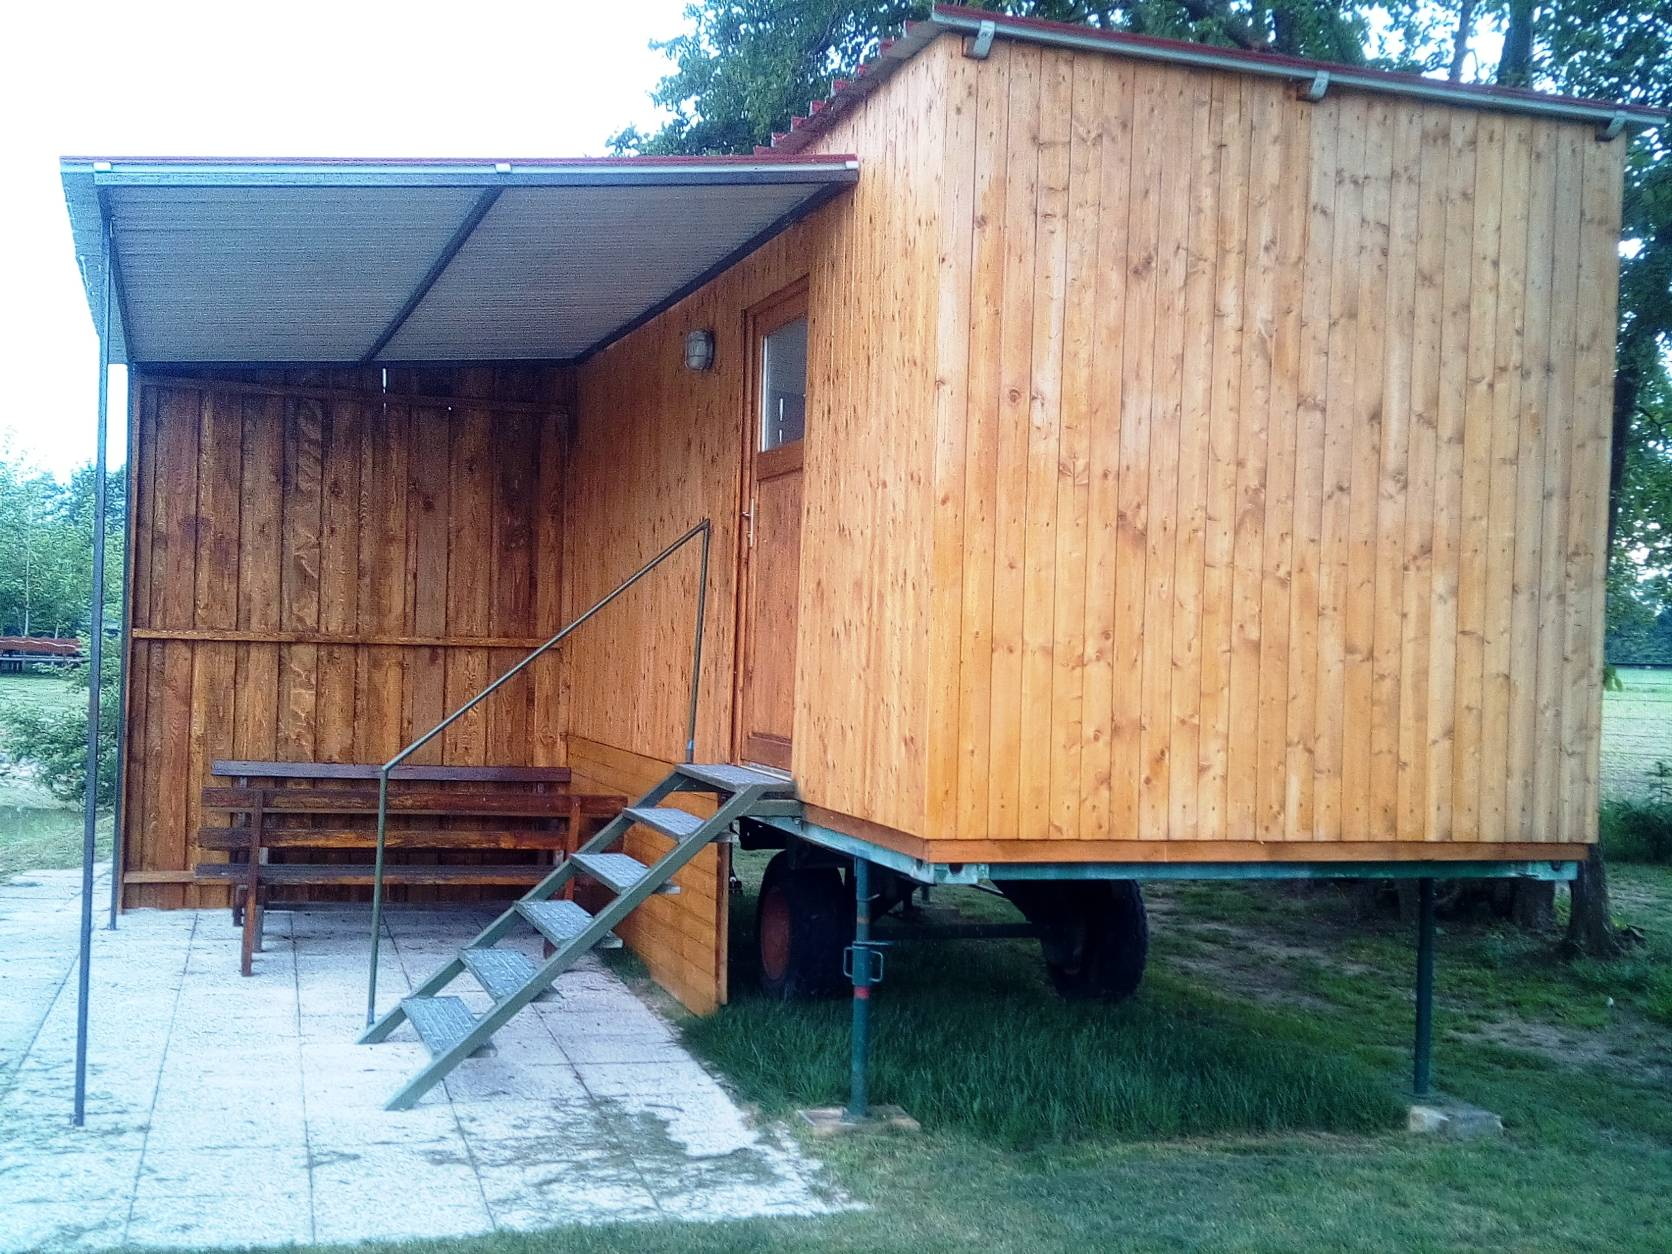 lawis fischerparadies h tte mieten zelten wohnmobil. Black Bedroom Furniture Sets. Home Design Ideas